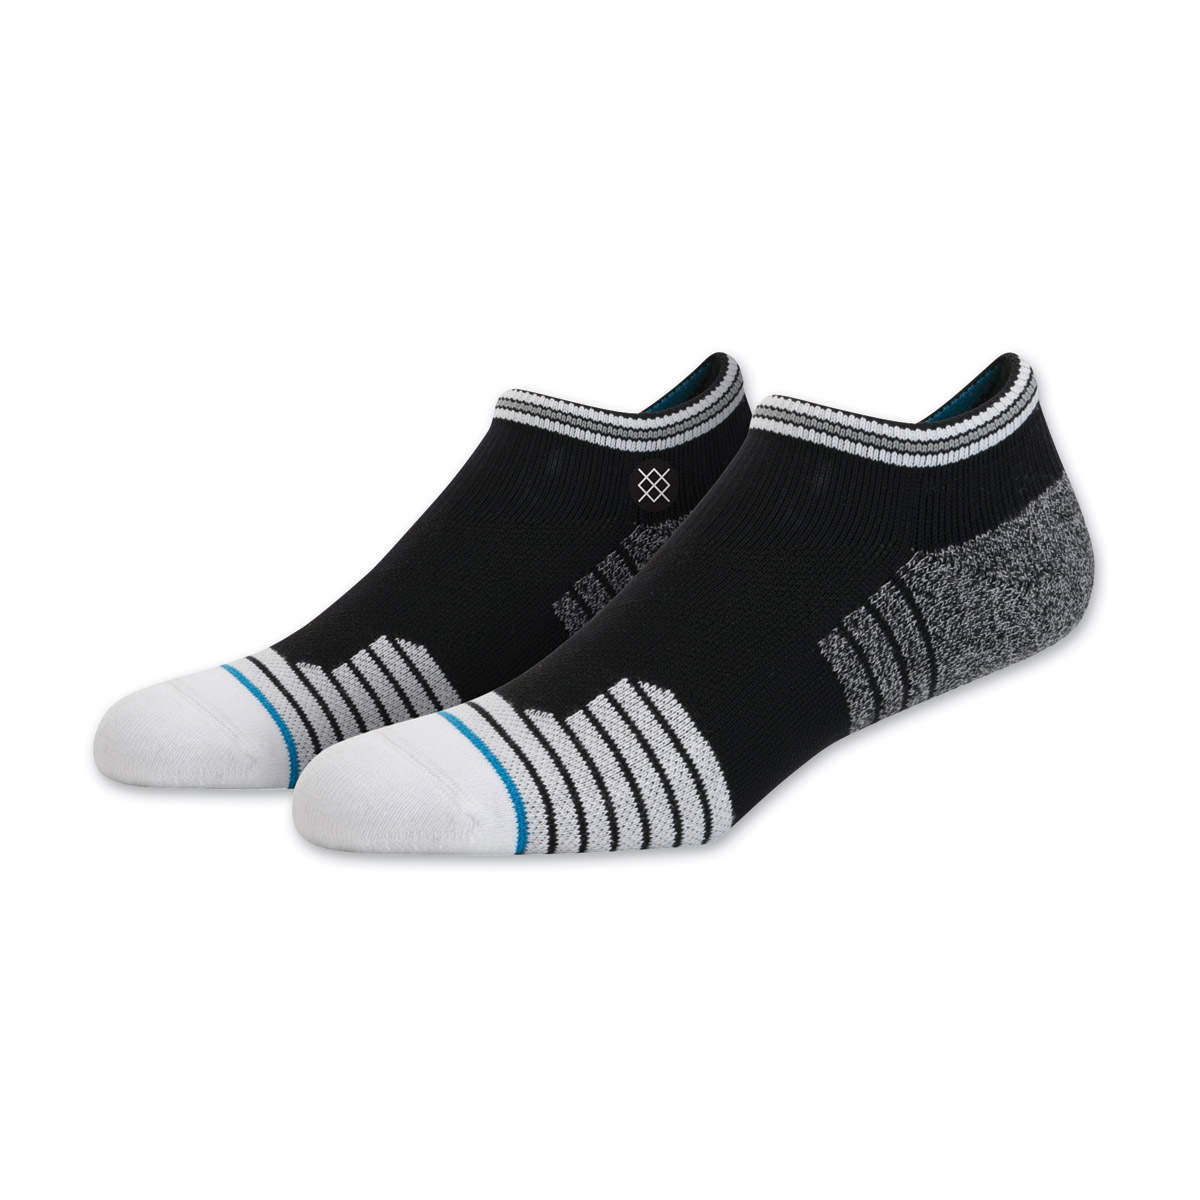 Stance Men's Guilded Low Cut Black/White Sock